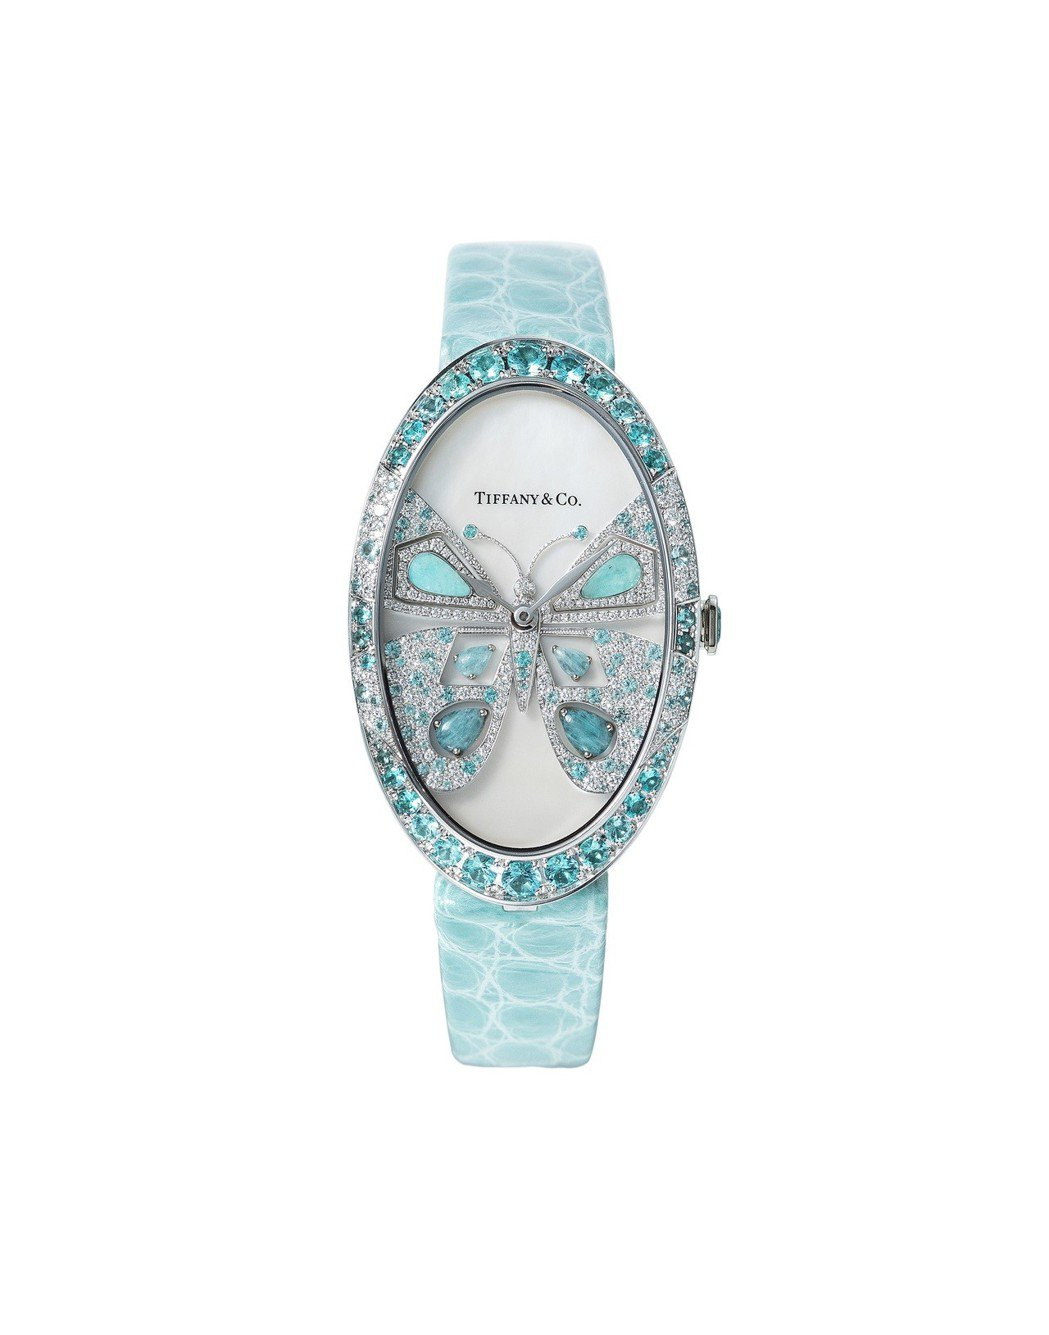 大中華地區Tiffany高級珠寶腕系表列,Tiffany Cocktail高級珠...